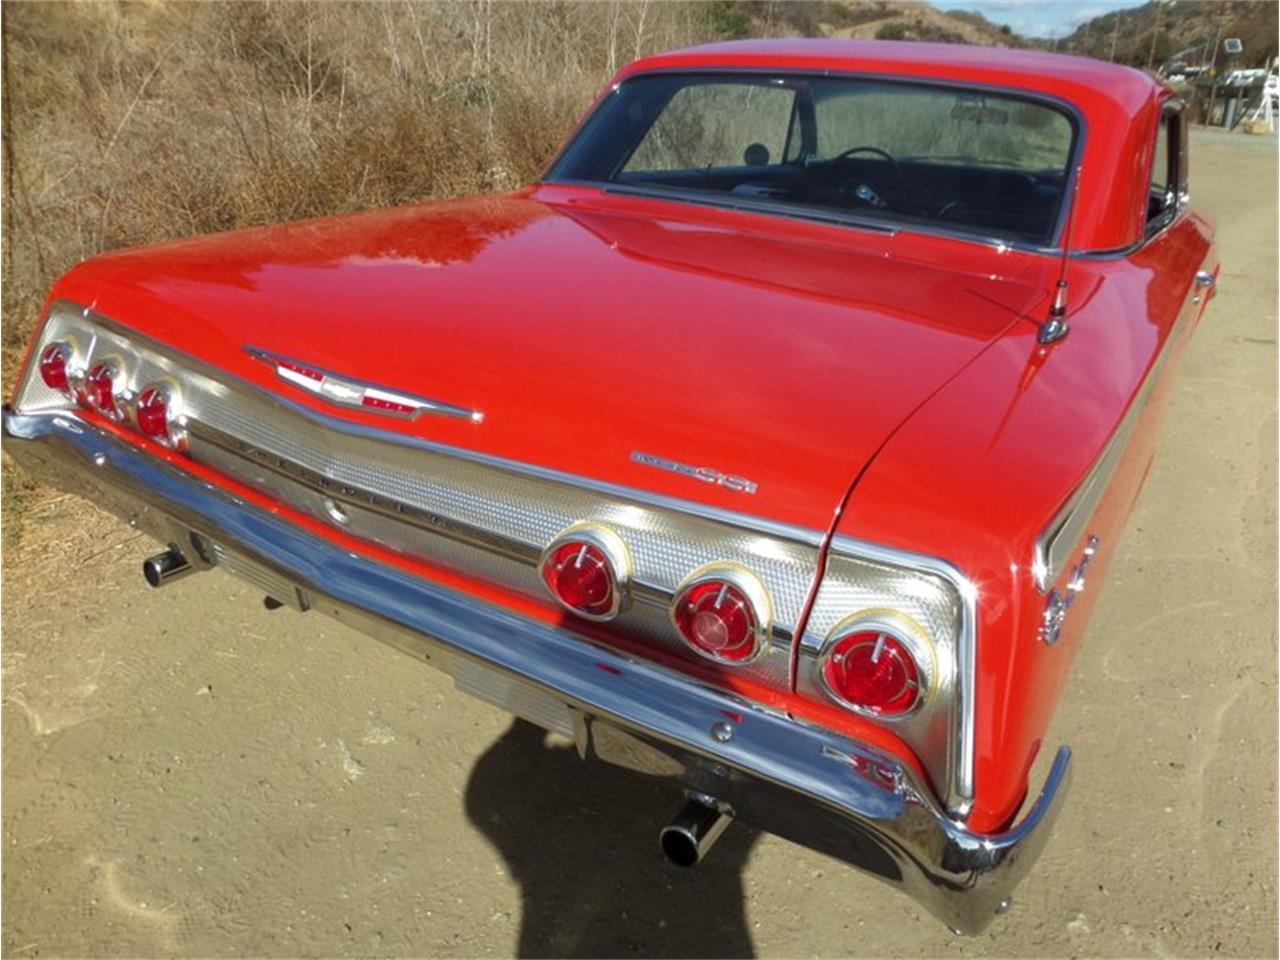 1962 Chevrolet Impala (CC-1220991) for sale in Laguna Beach, California